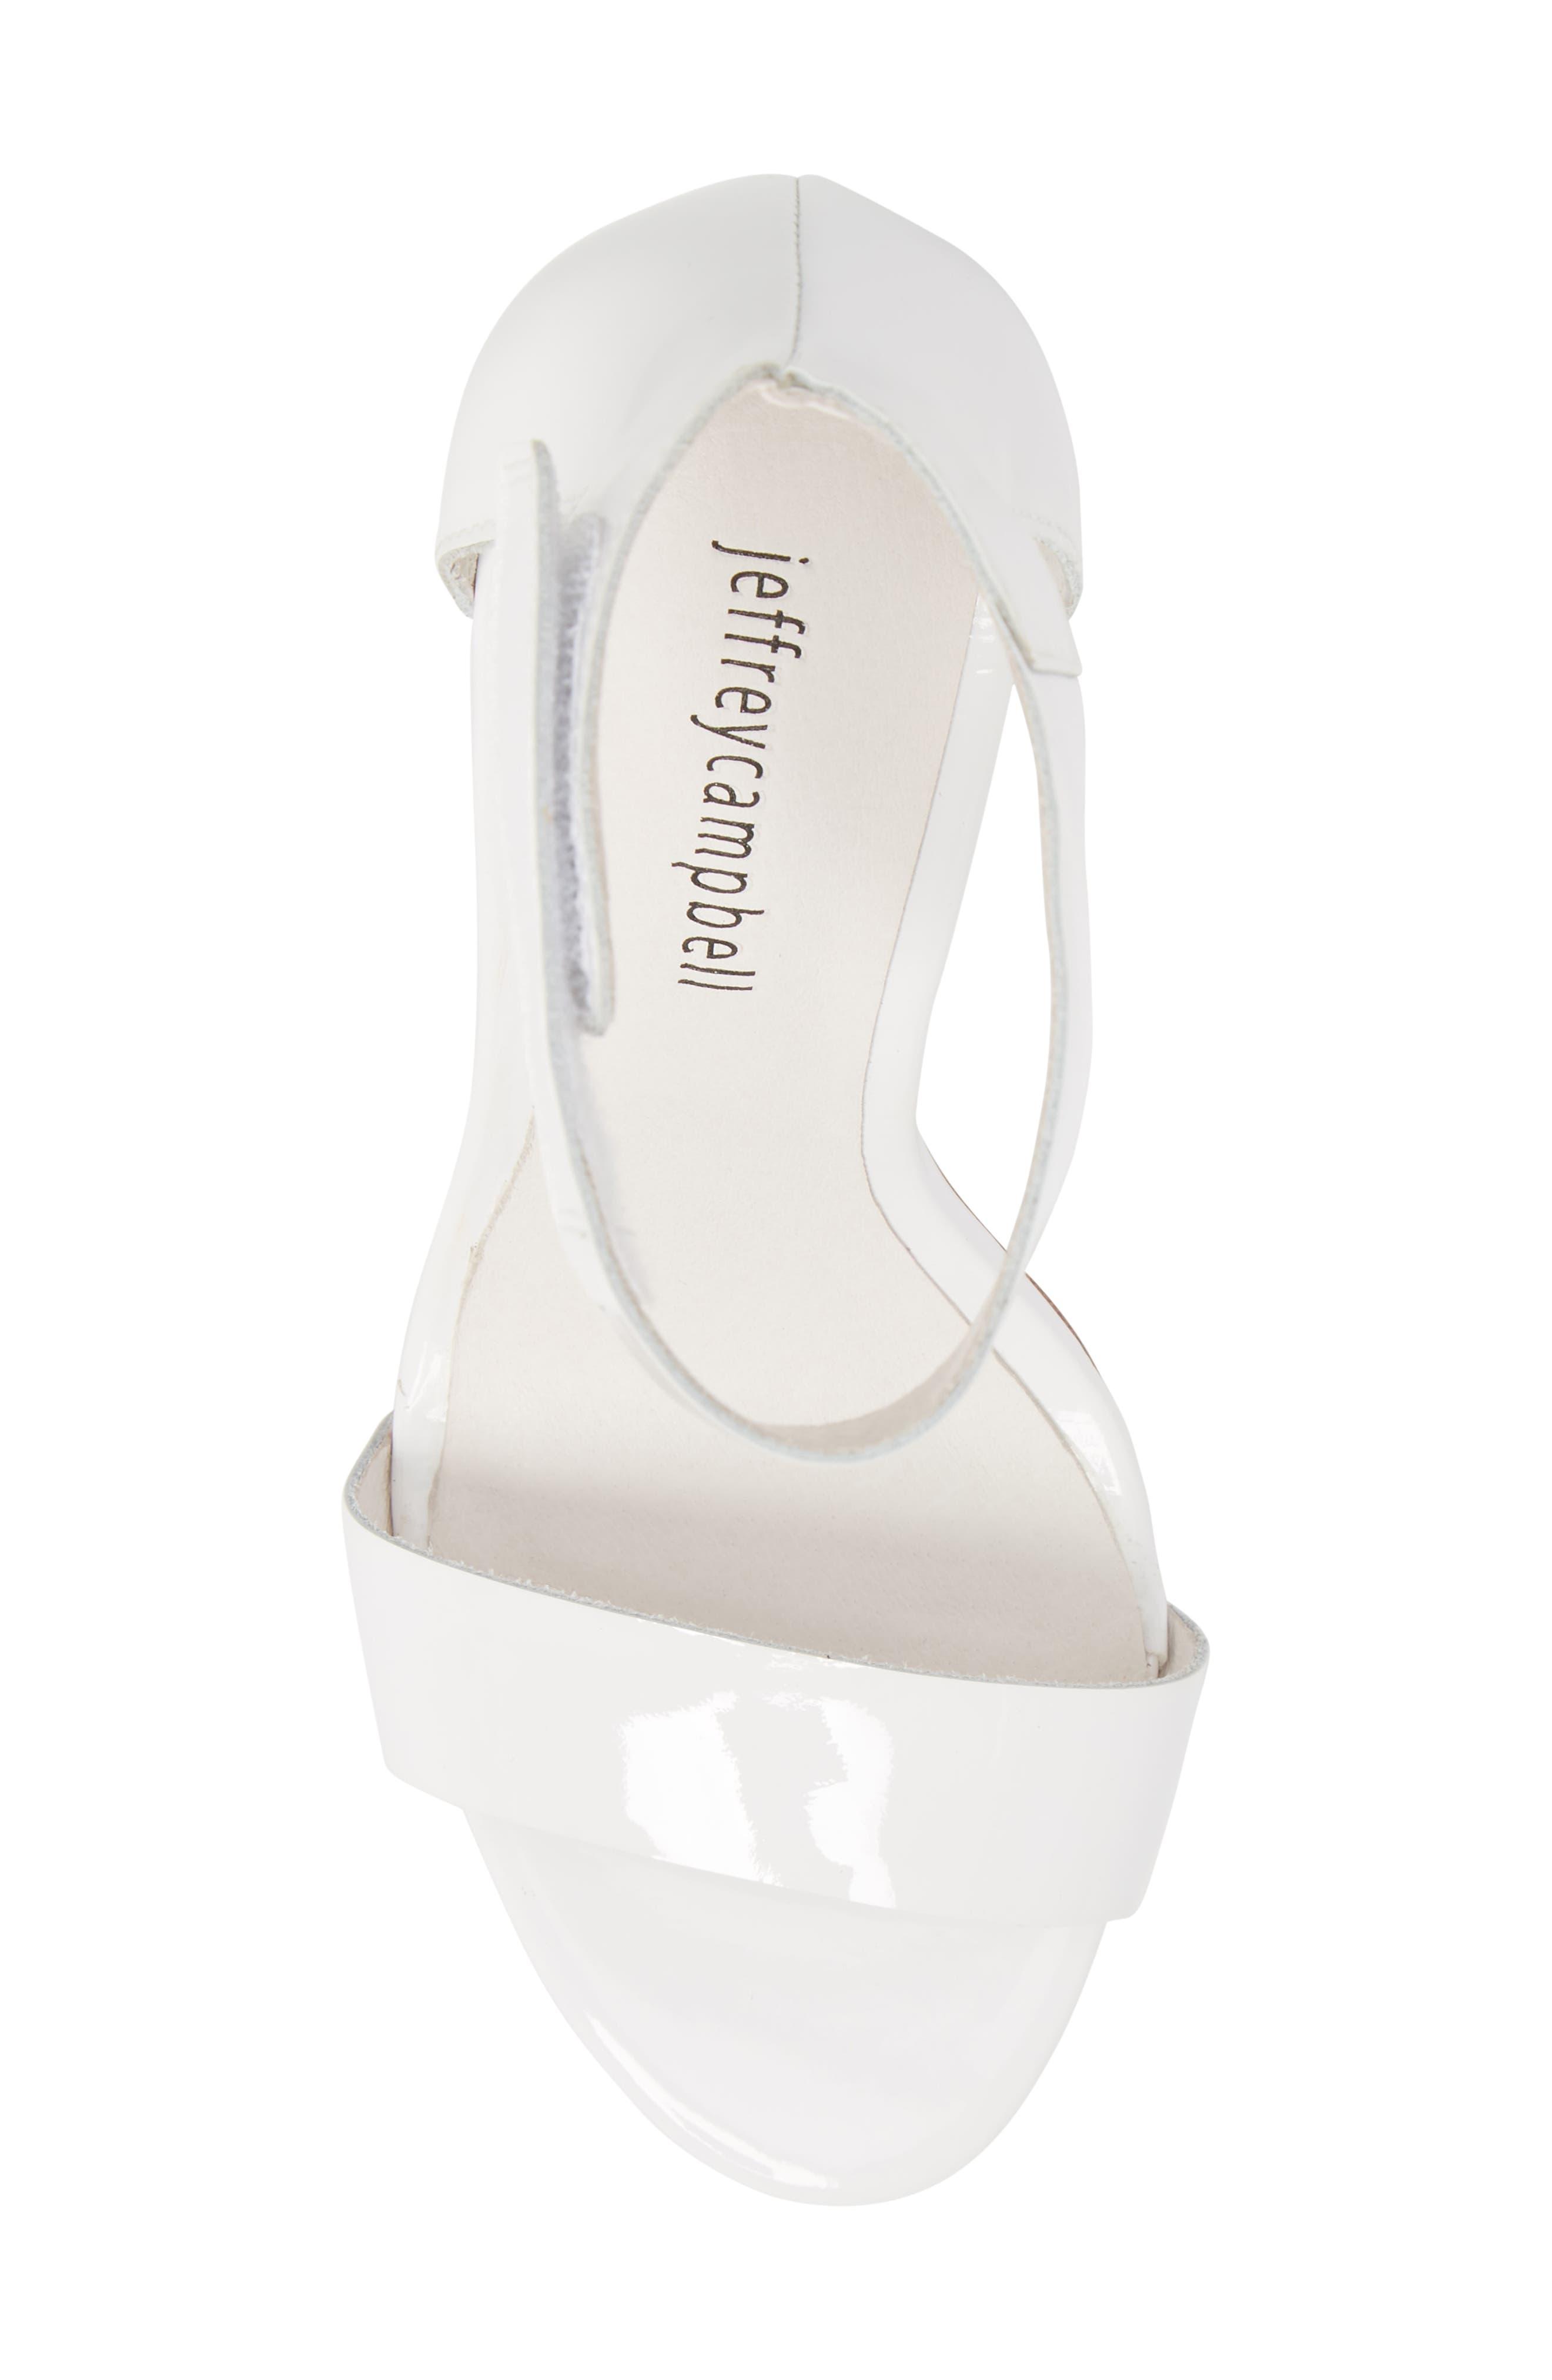 Alessa Clear Heel Sandal,                             Alternate thumbnail 5, color,                             White Patent